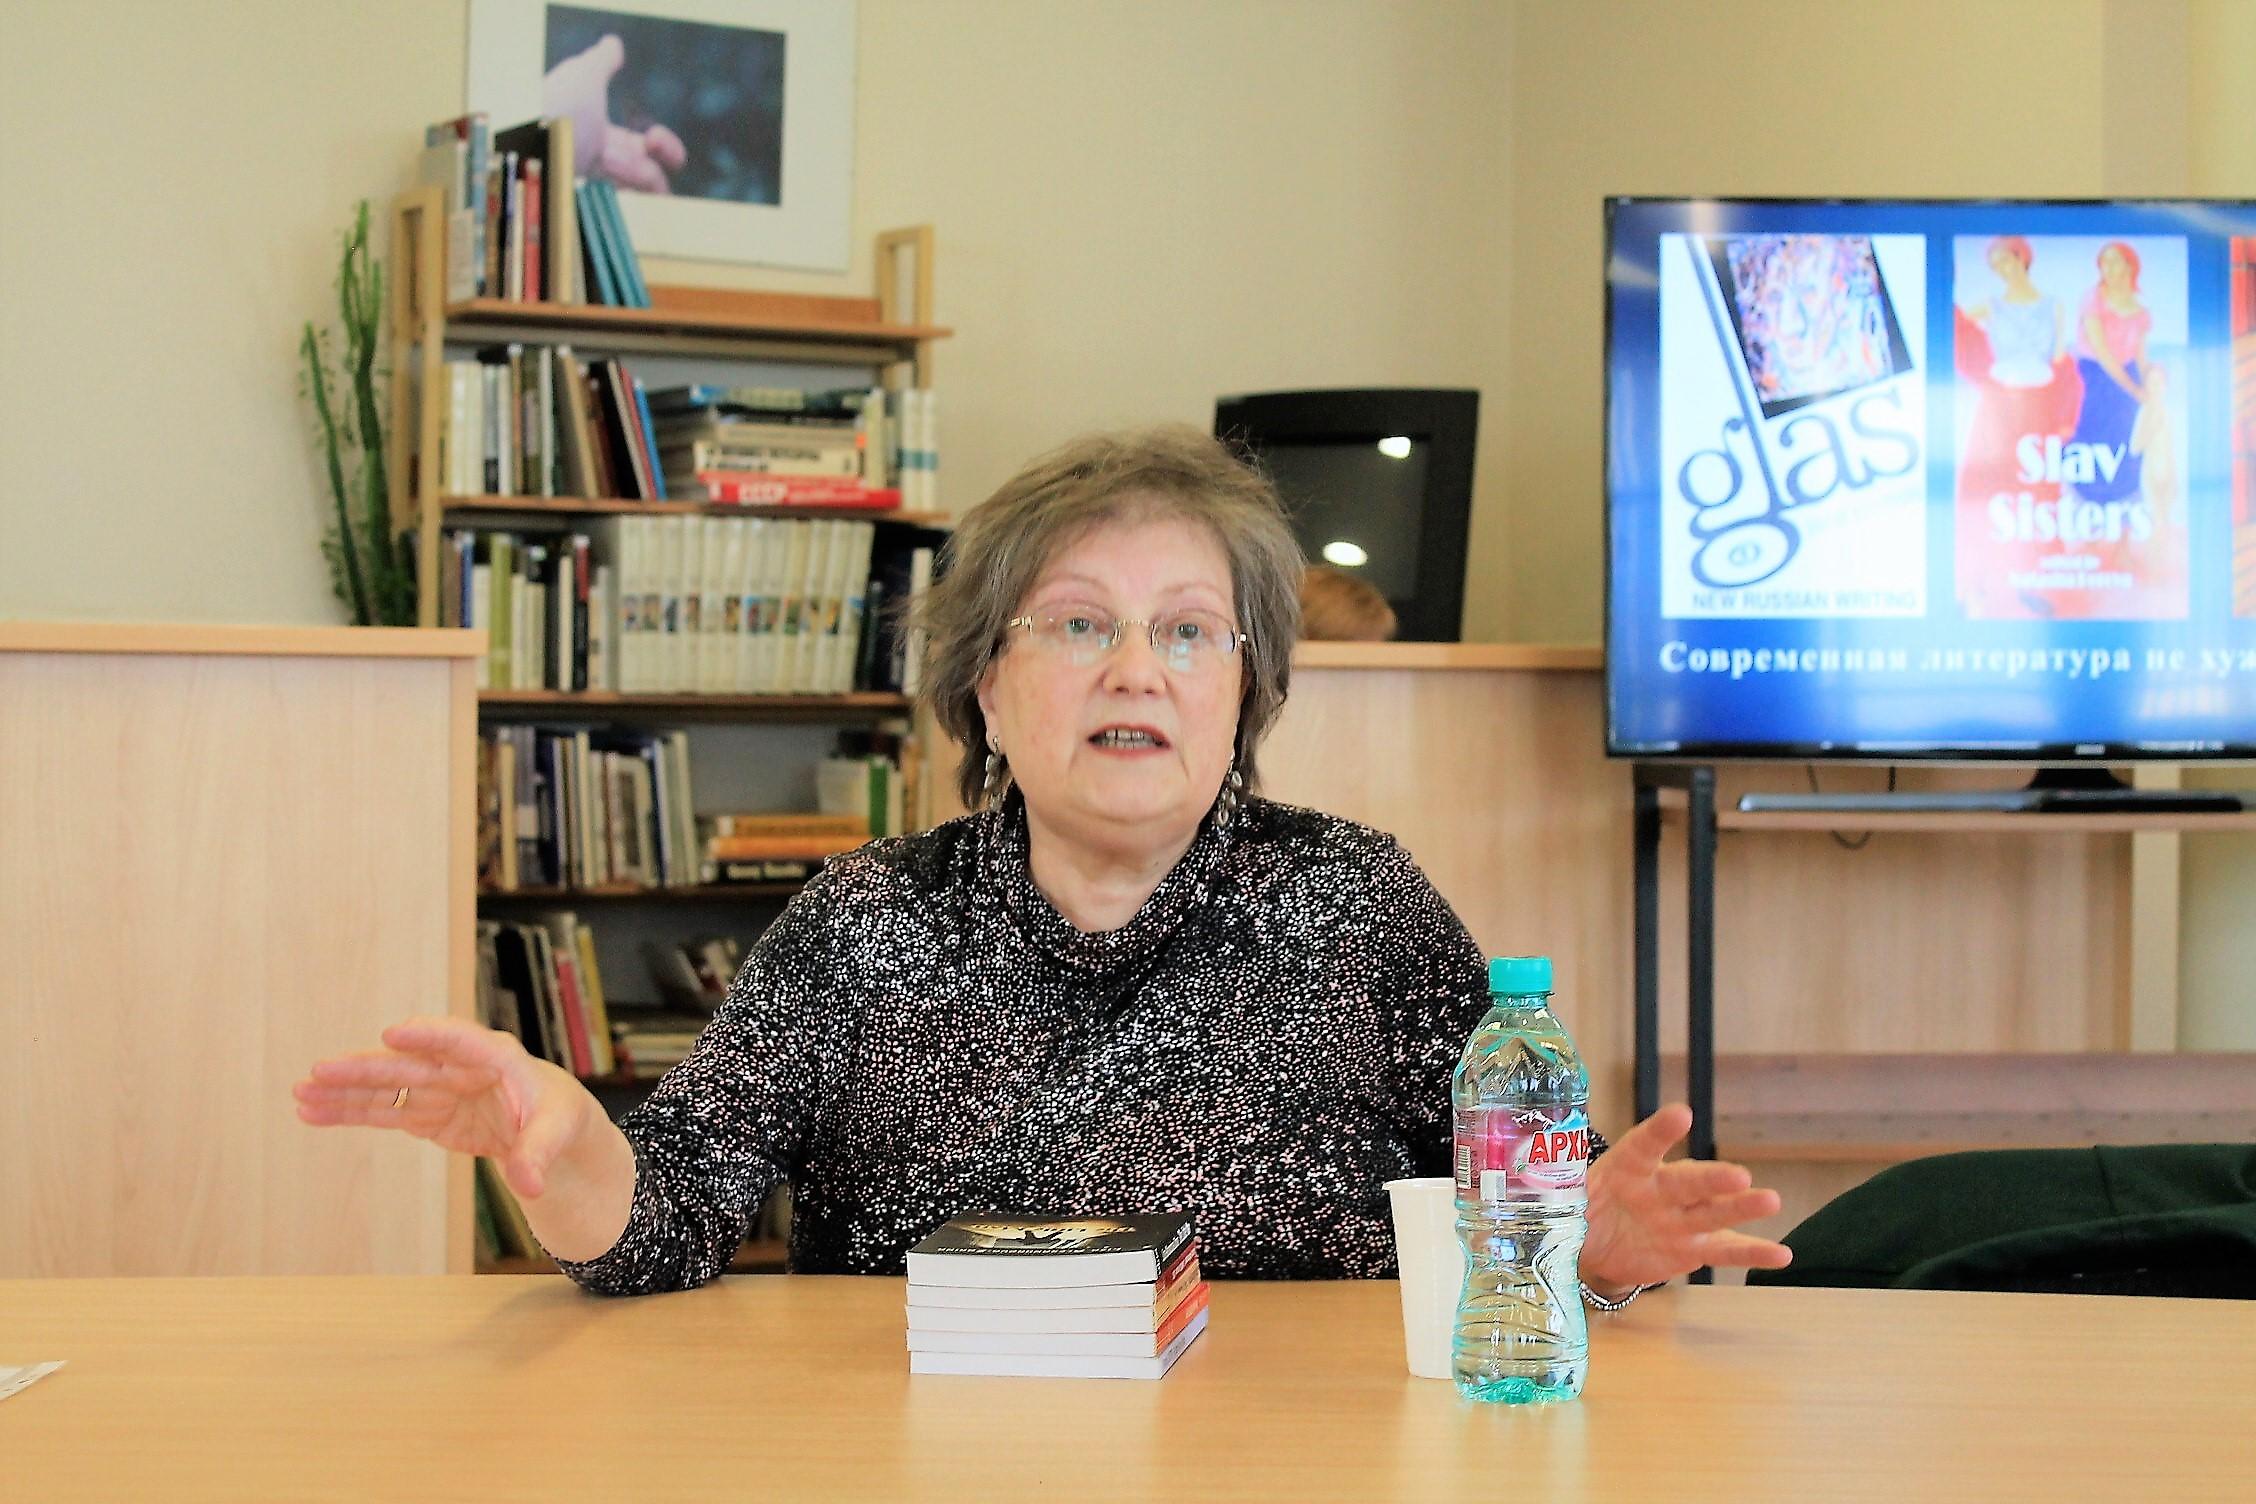 Special guest Natasha Perova speaks on contemporary Russian literature